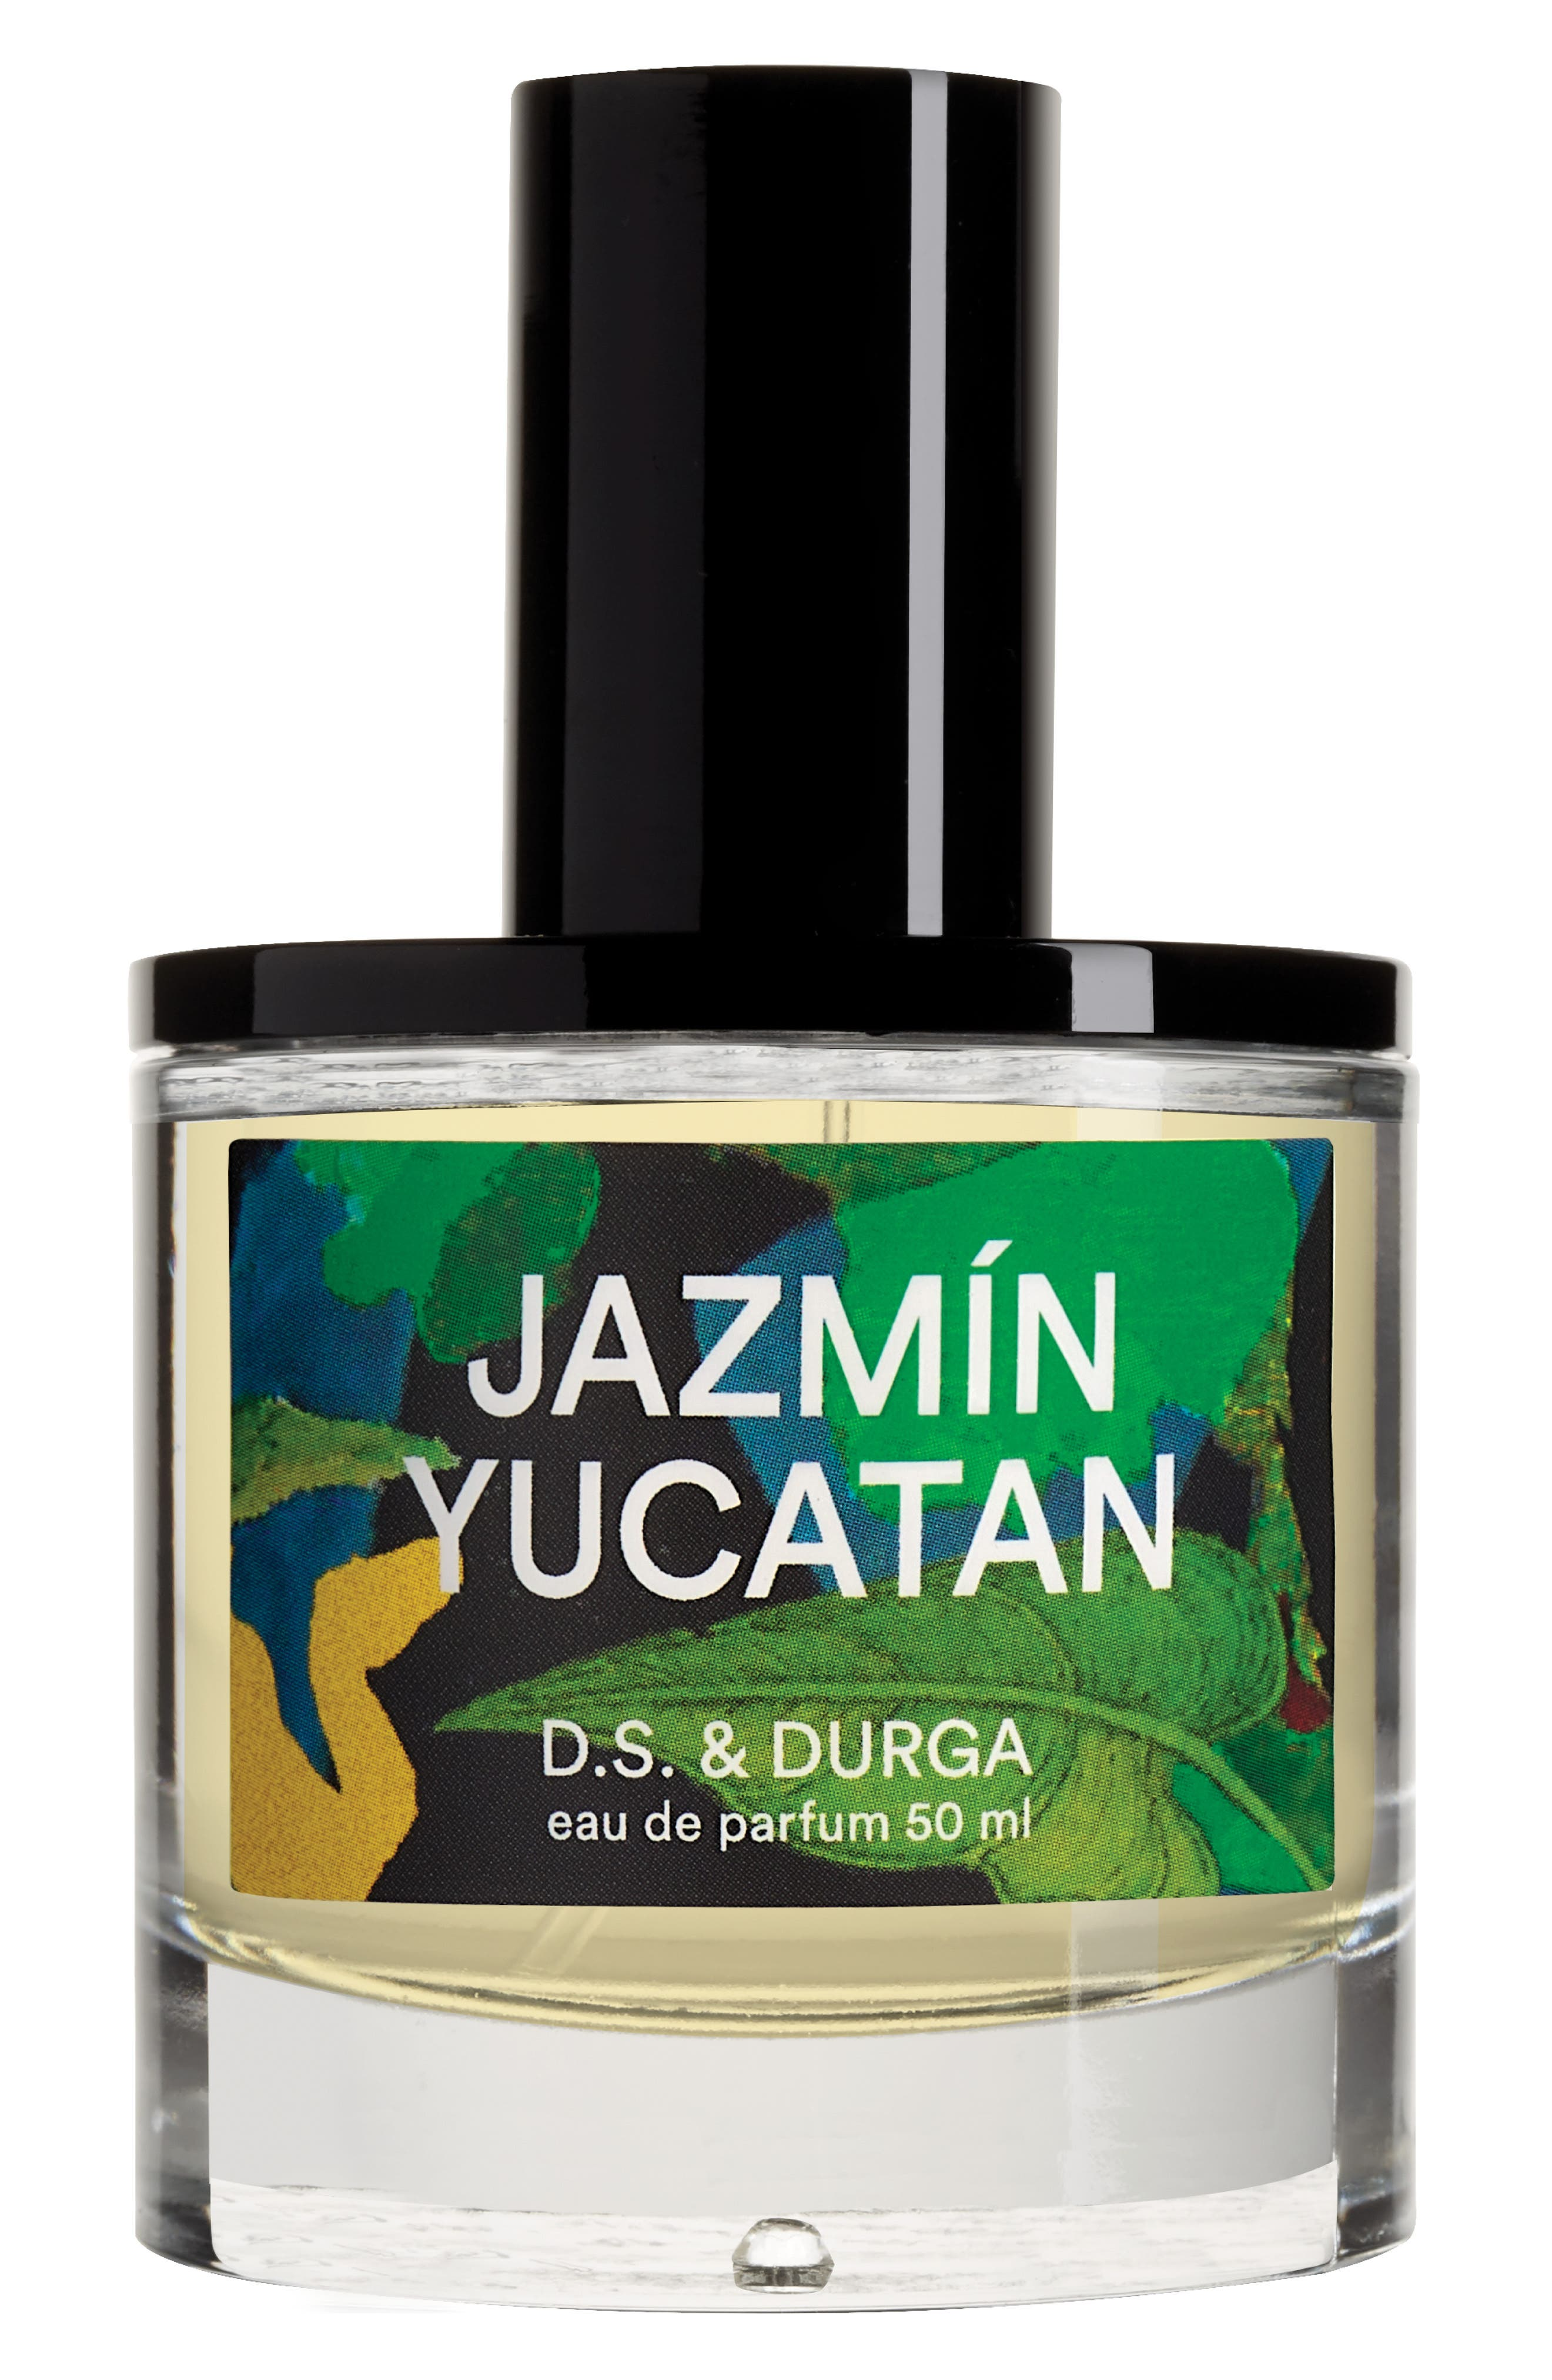 Jazmin Yucatan Eau De Parfum